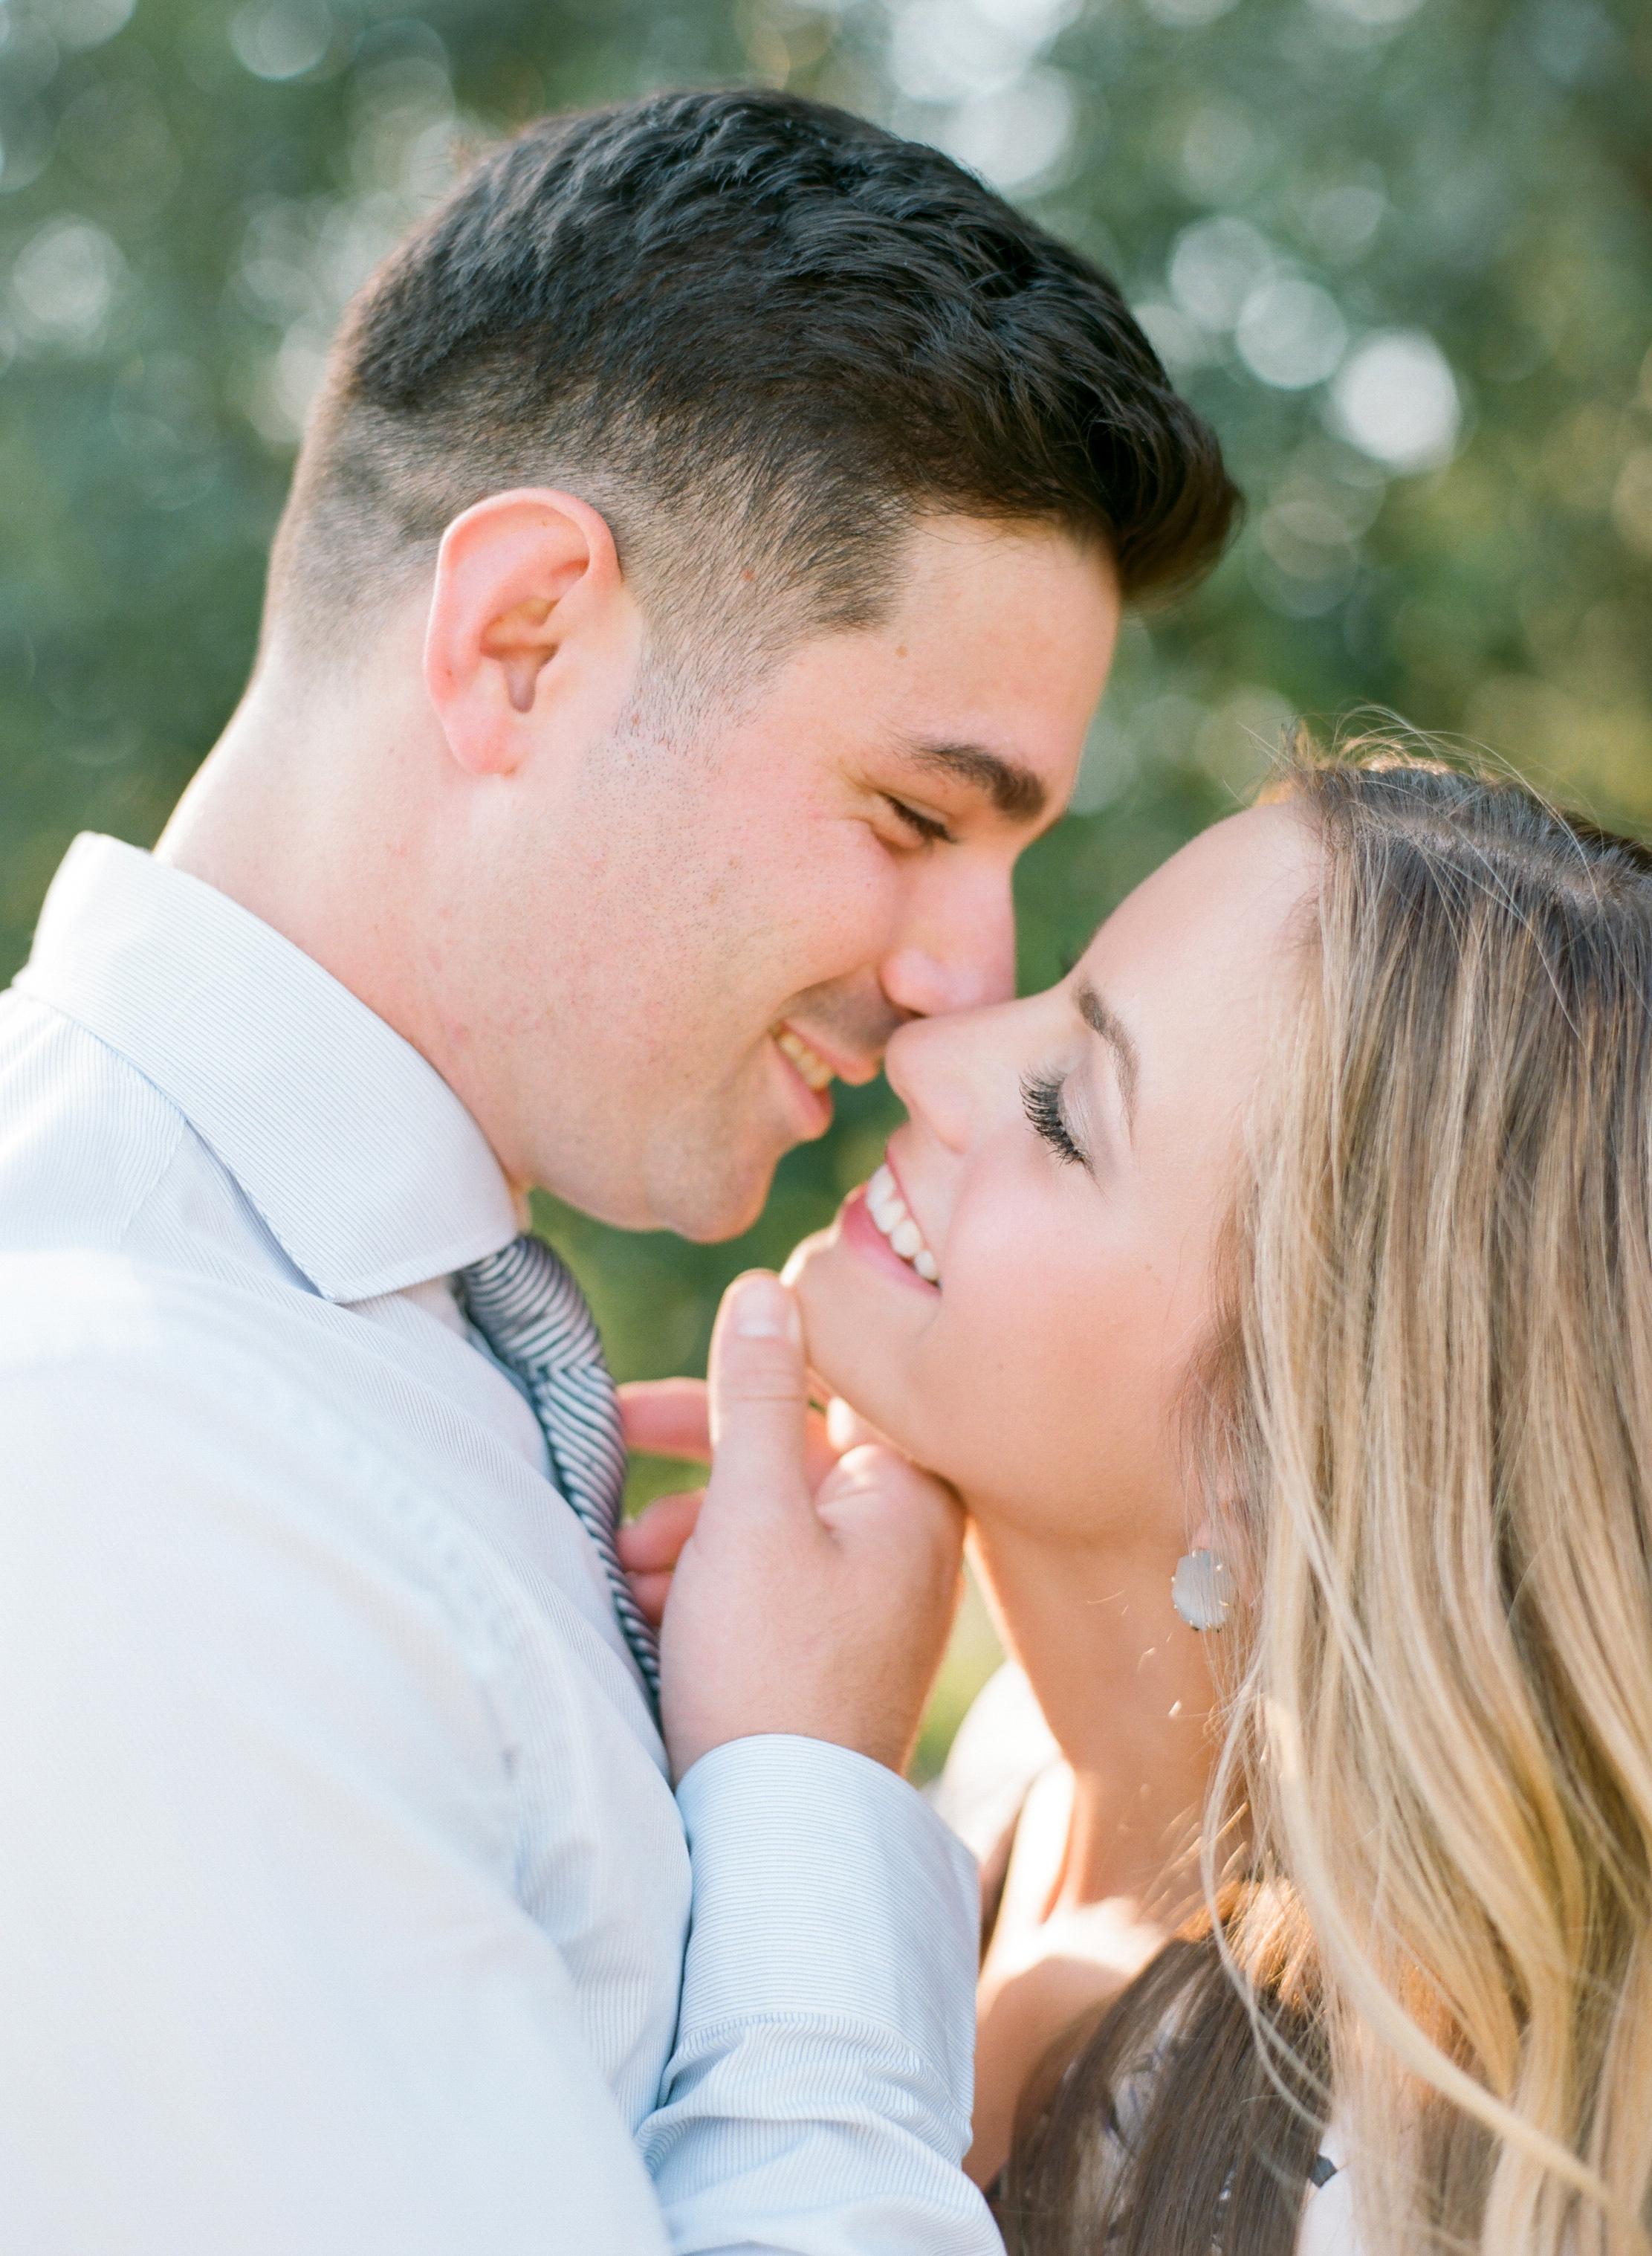 Dana-Fernandez-Photography-Houston-Engagement-Wedding-Film-Photographer-3.jpg